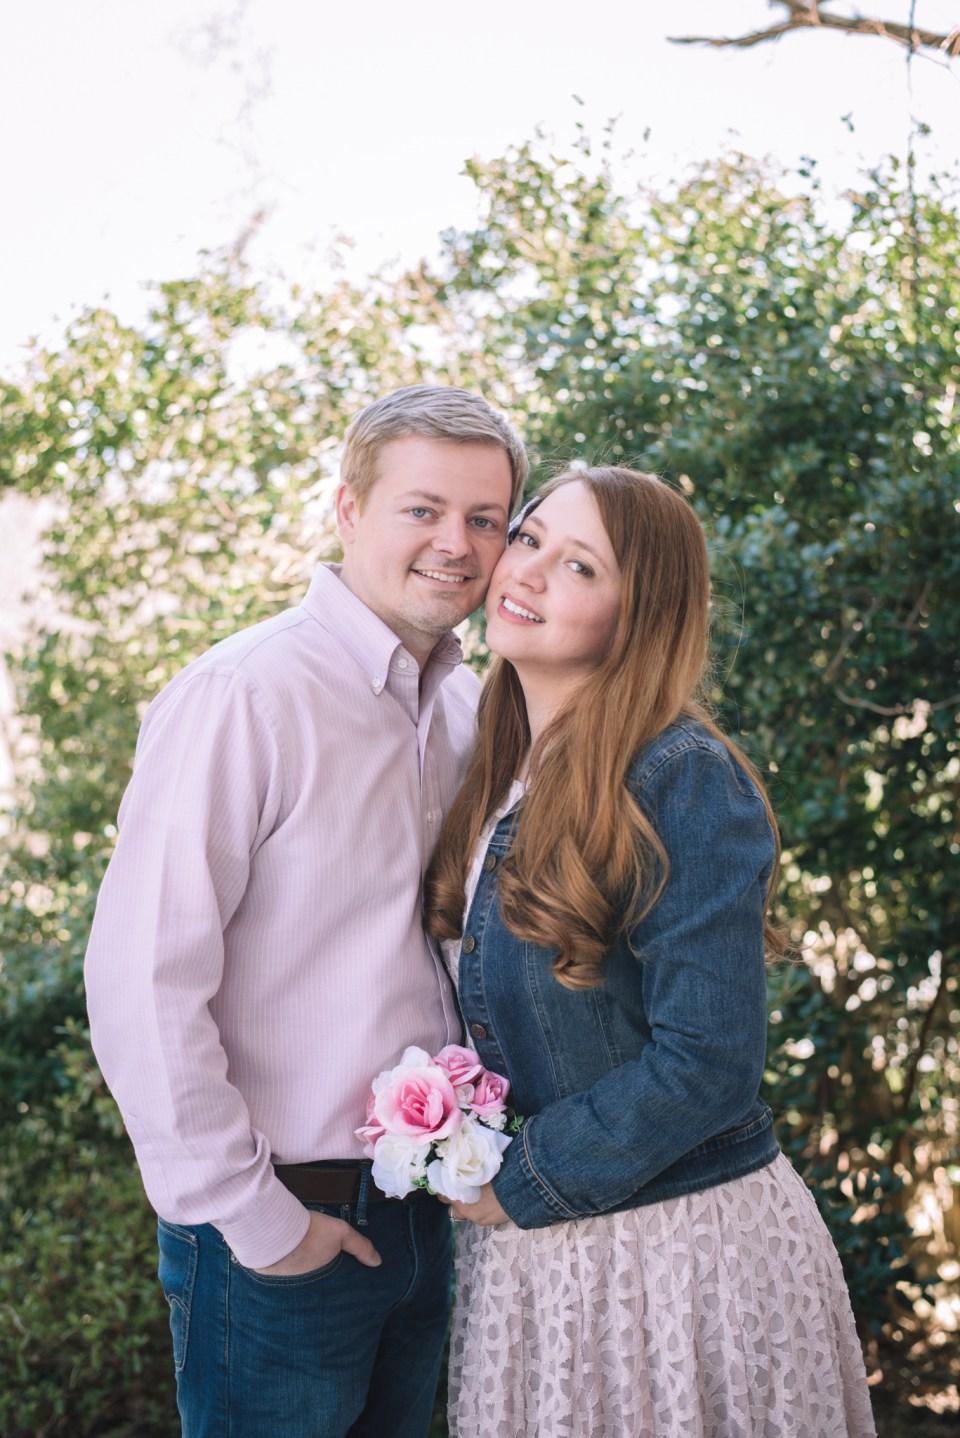 Liz and Aaron Engagement - 011